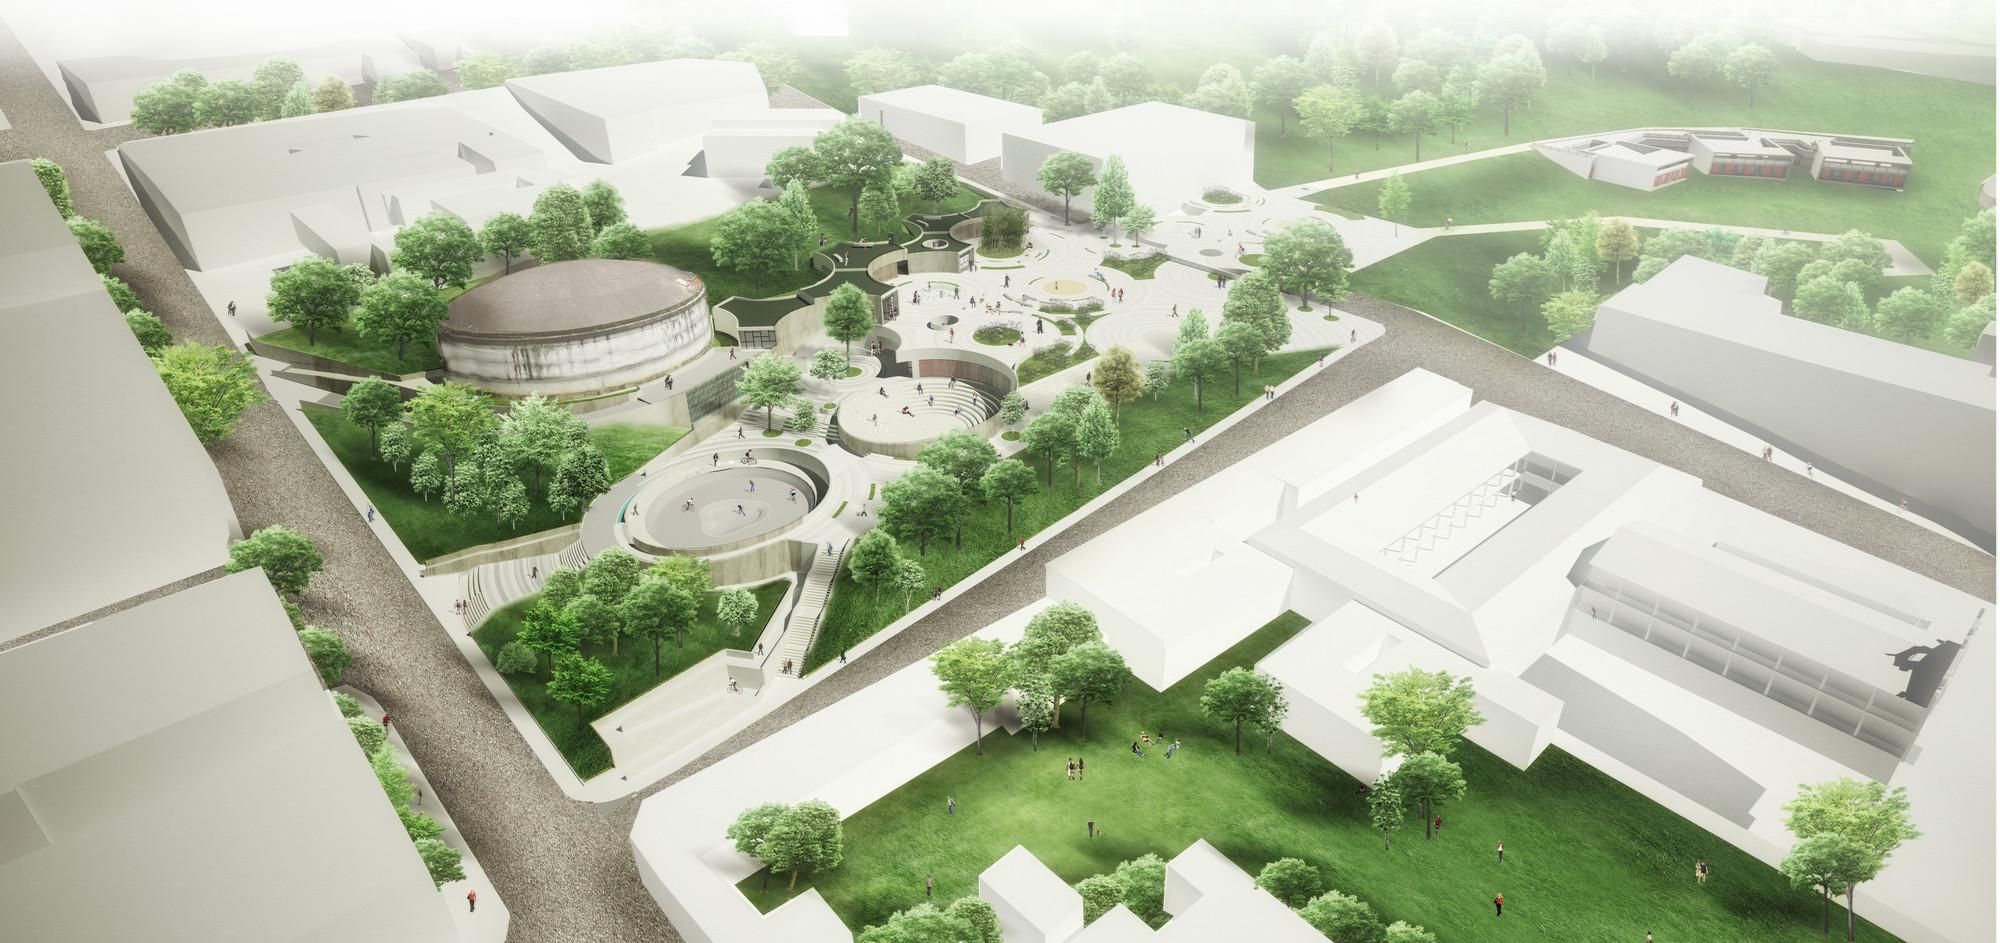 Segundo Lugar en concurso nacional UVA Orfelinato / Medellín, Colombia, Courtesy of Labranza Arquitectura S.A.S.